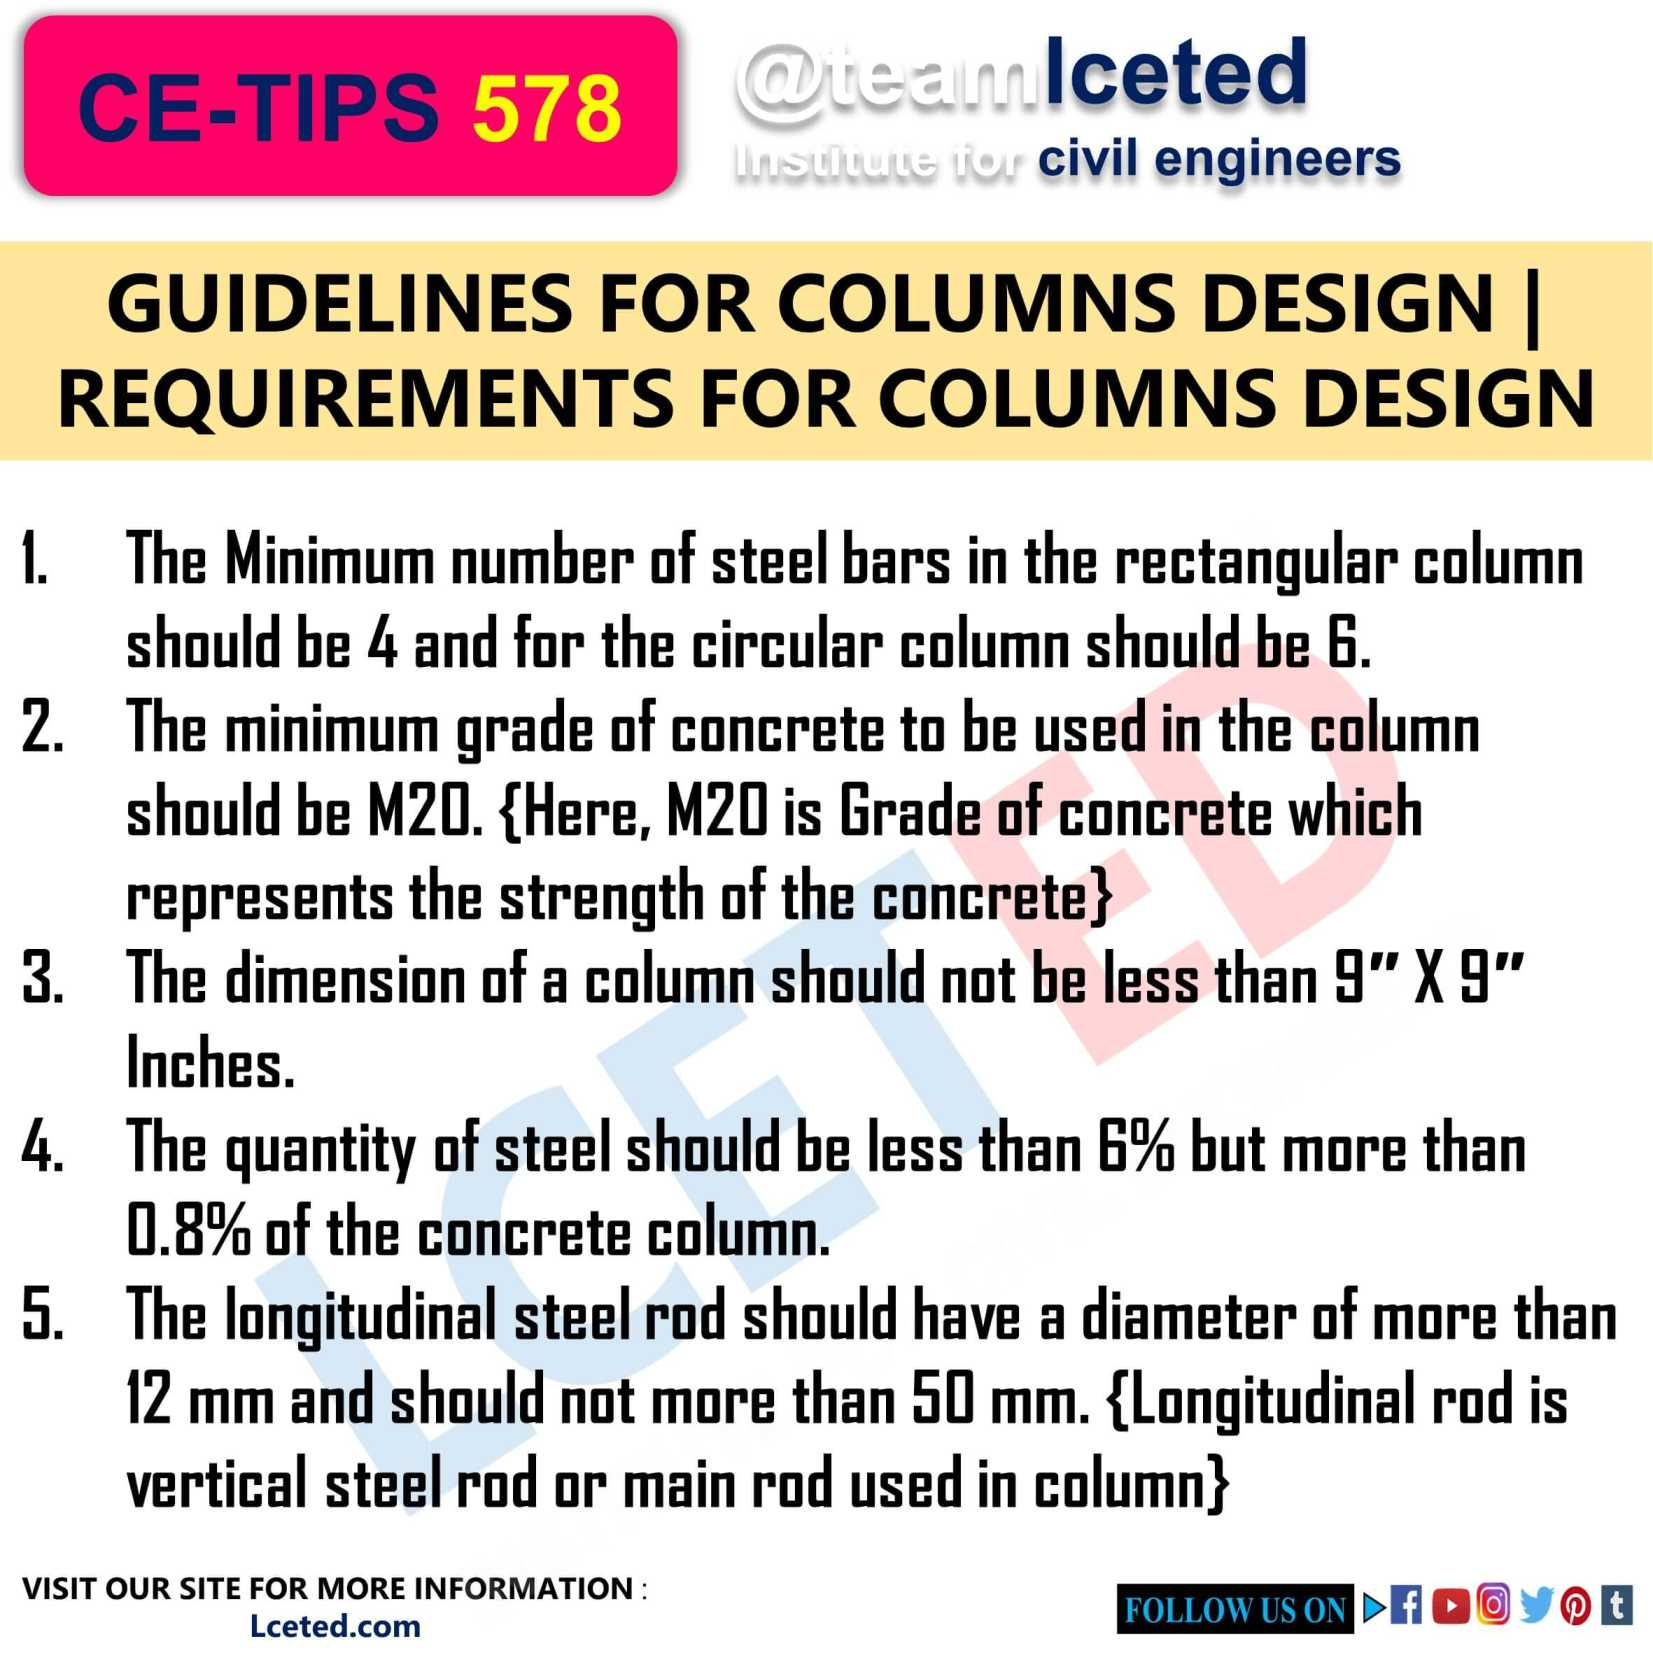 GUIDELINES FOR COLUMNS DESIGN